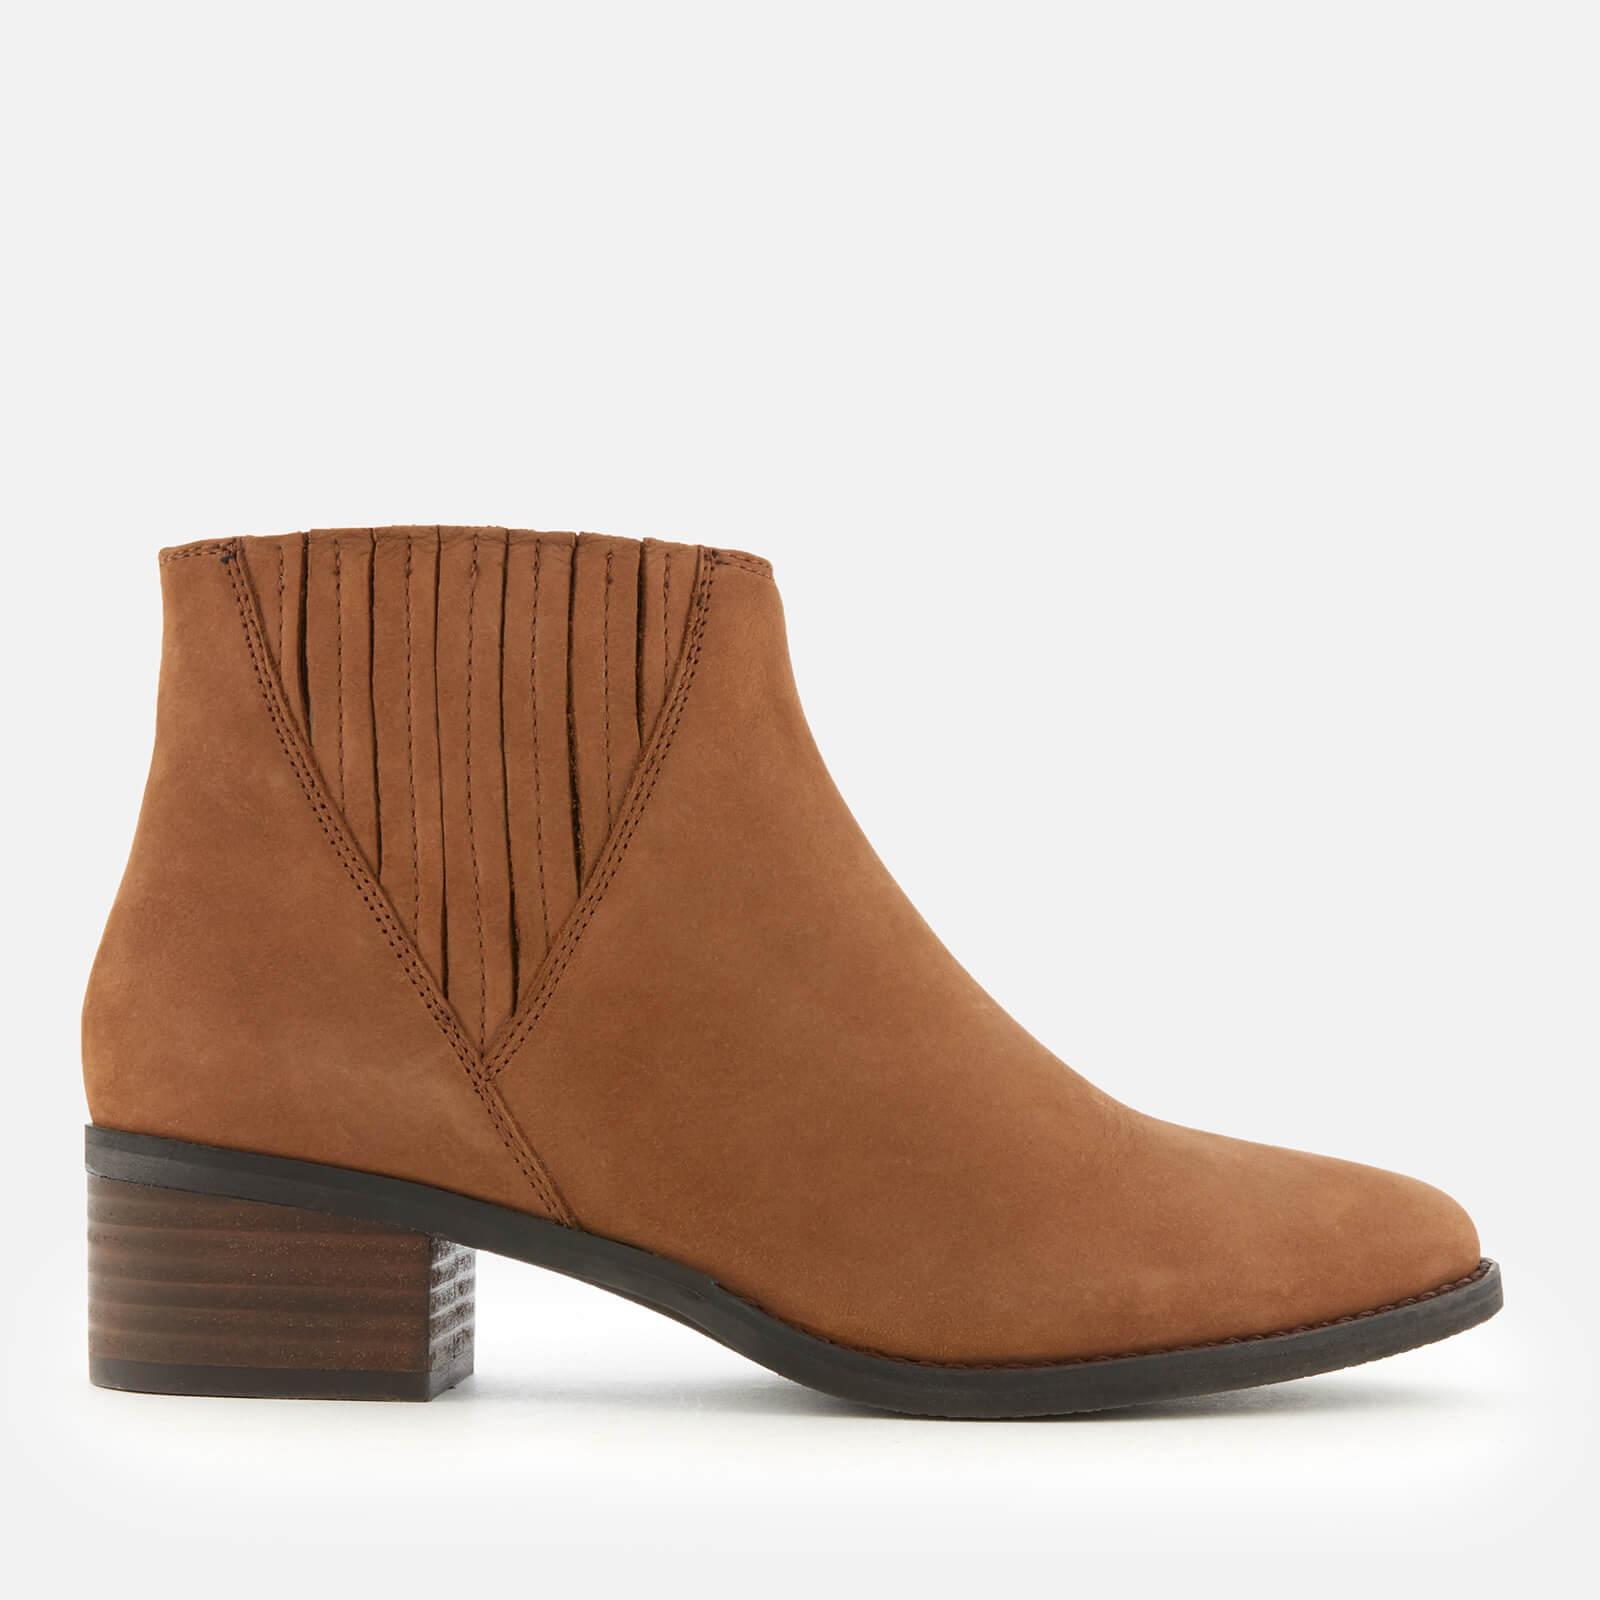 2c4b9256b5b Steve Madden Women s Always Nubuck Western Ankle Boots - Camel ...